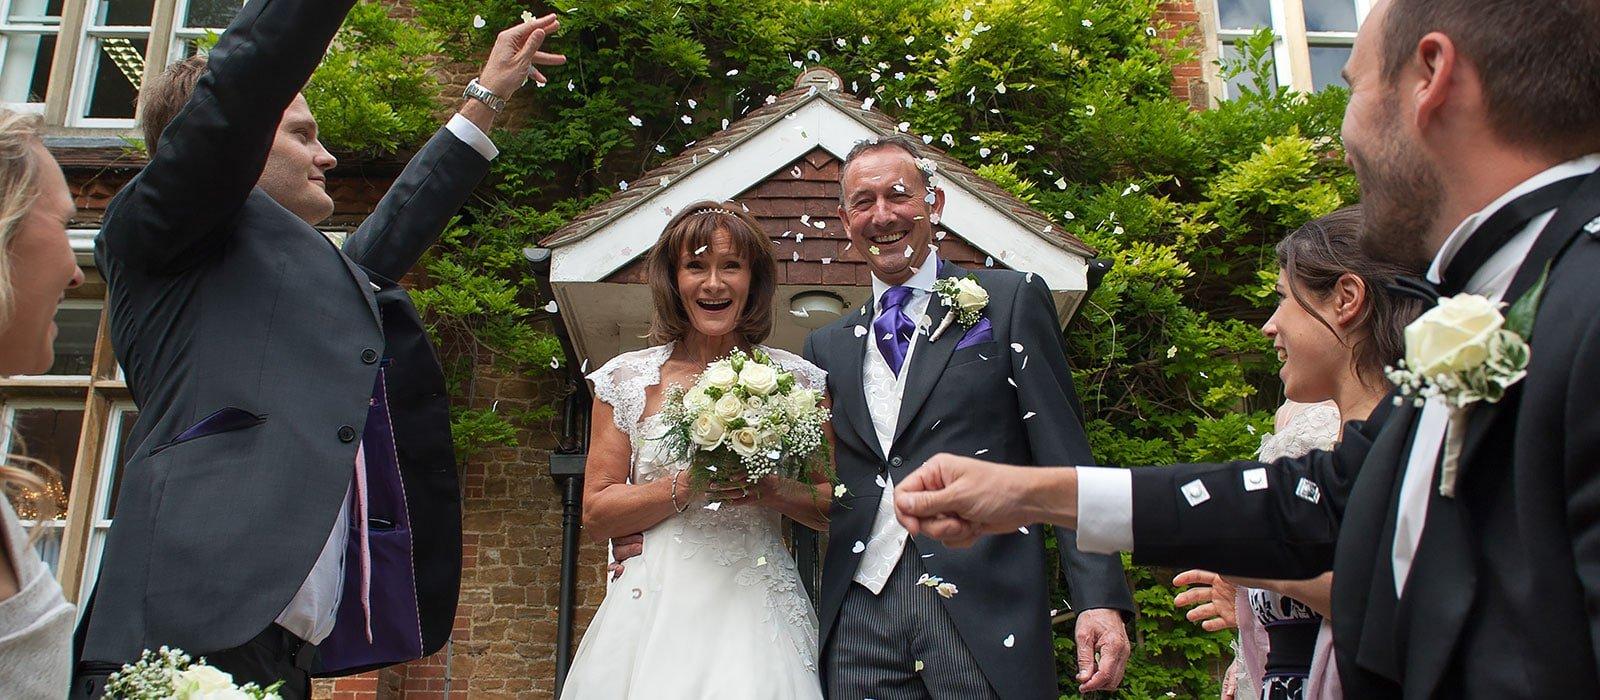 Guildford Register Office wedding photos | Richard & Dawn